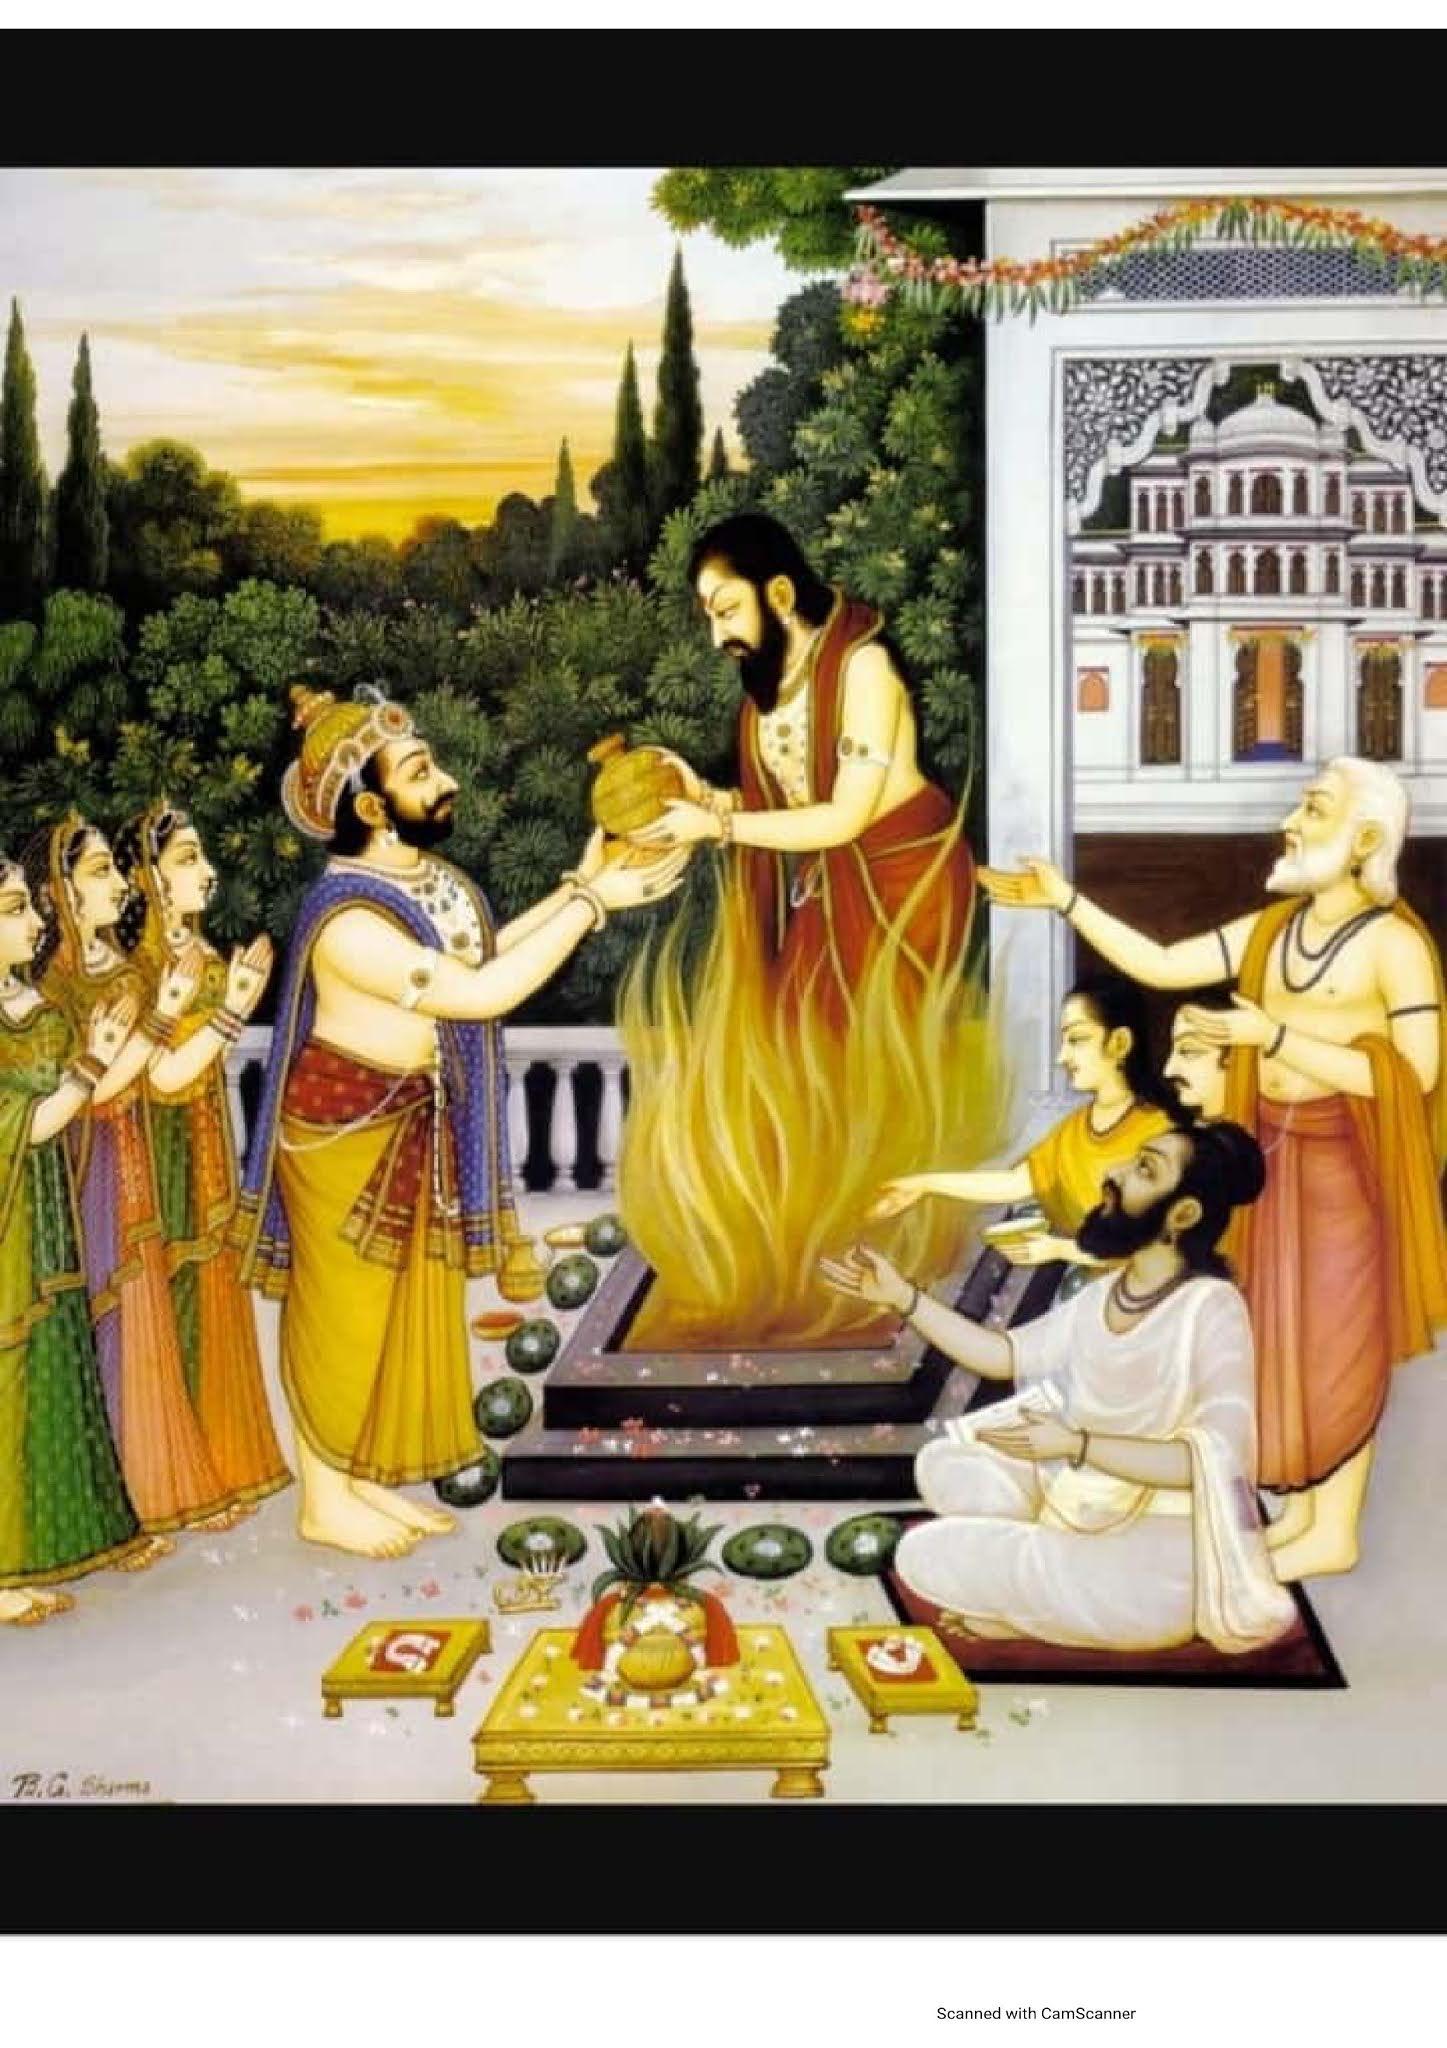 Ayodhya Street Wall Decoration - Sree Ram Charitra Manas images